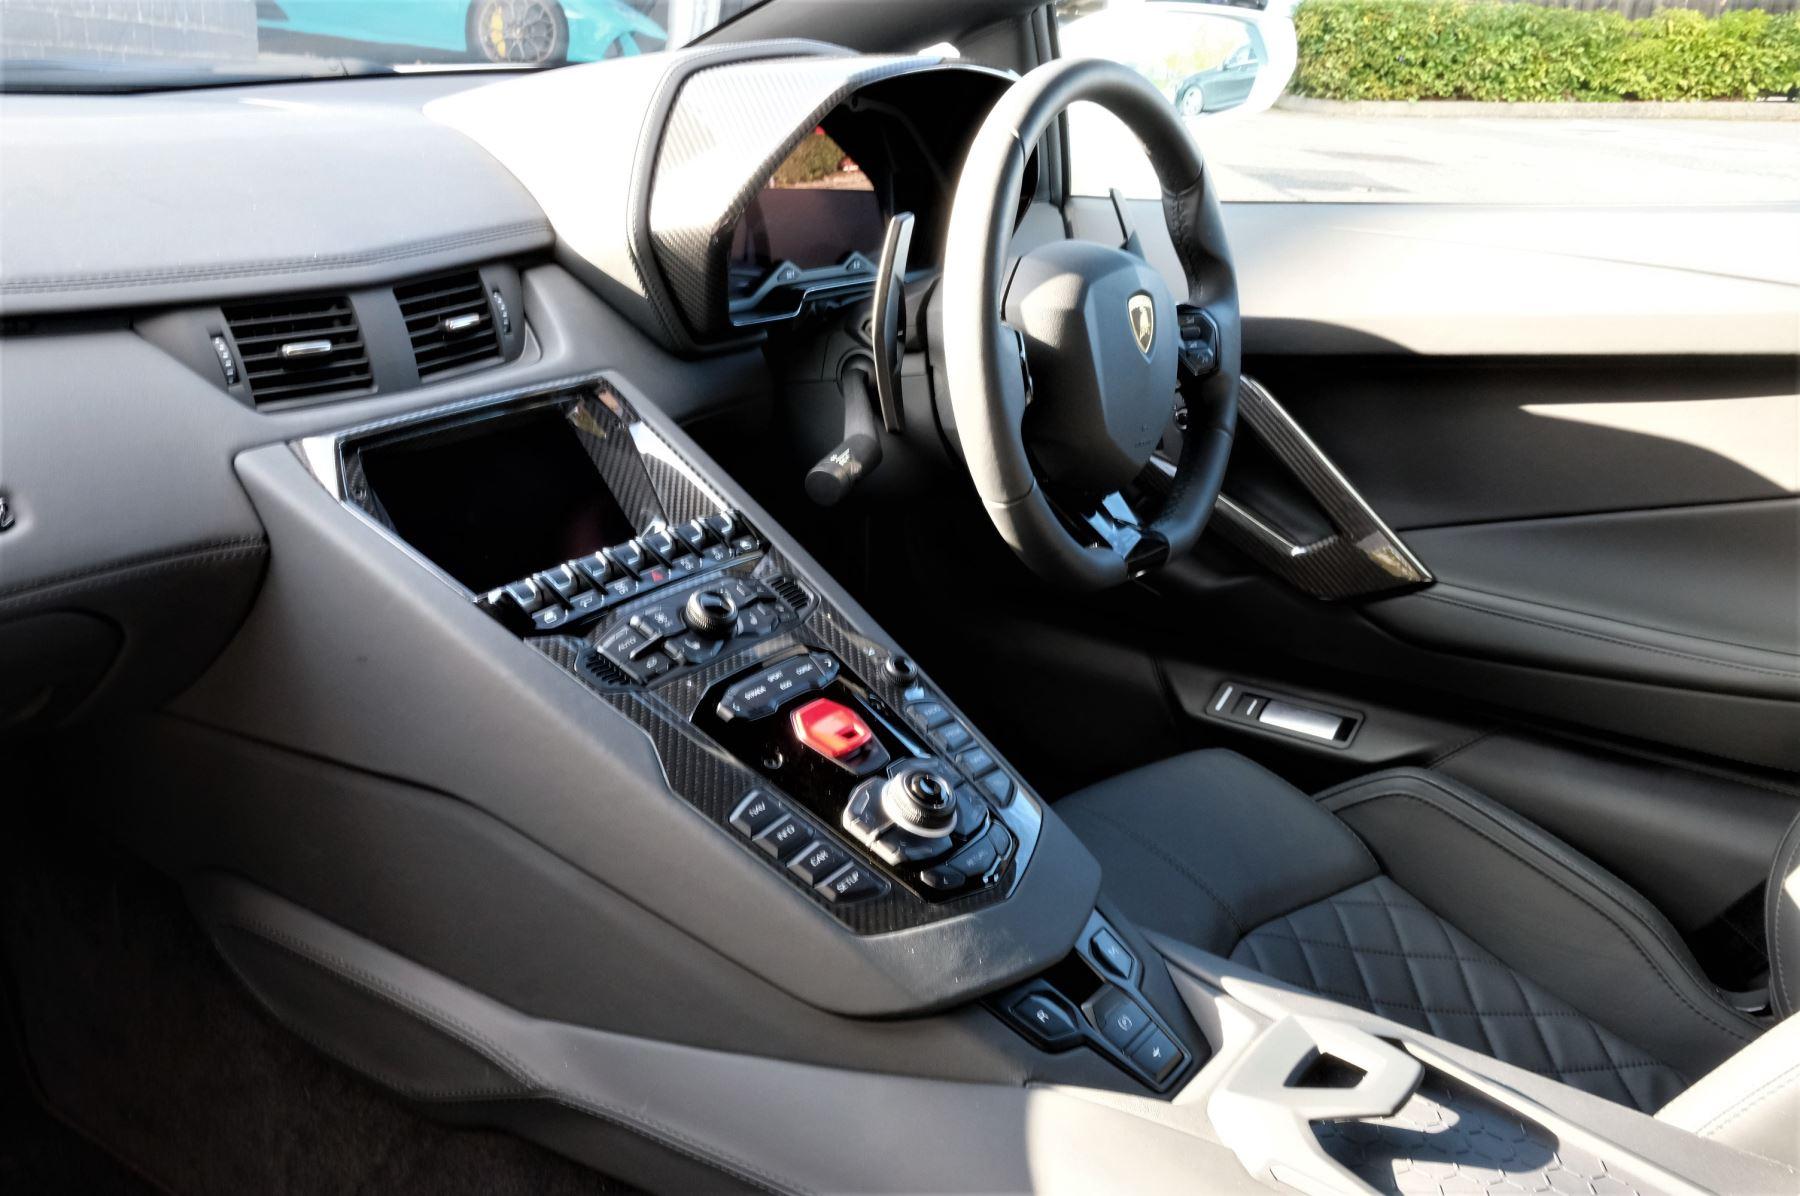 Lamborghini Aventador S AVENTADOR S LP 740-4 S-A image 7